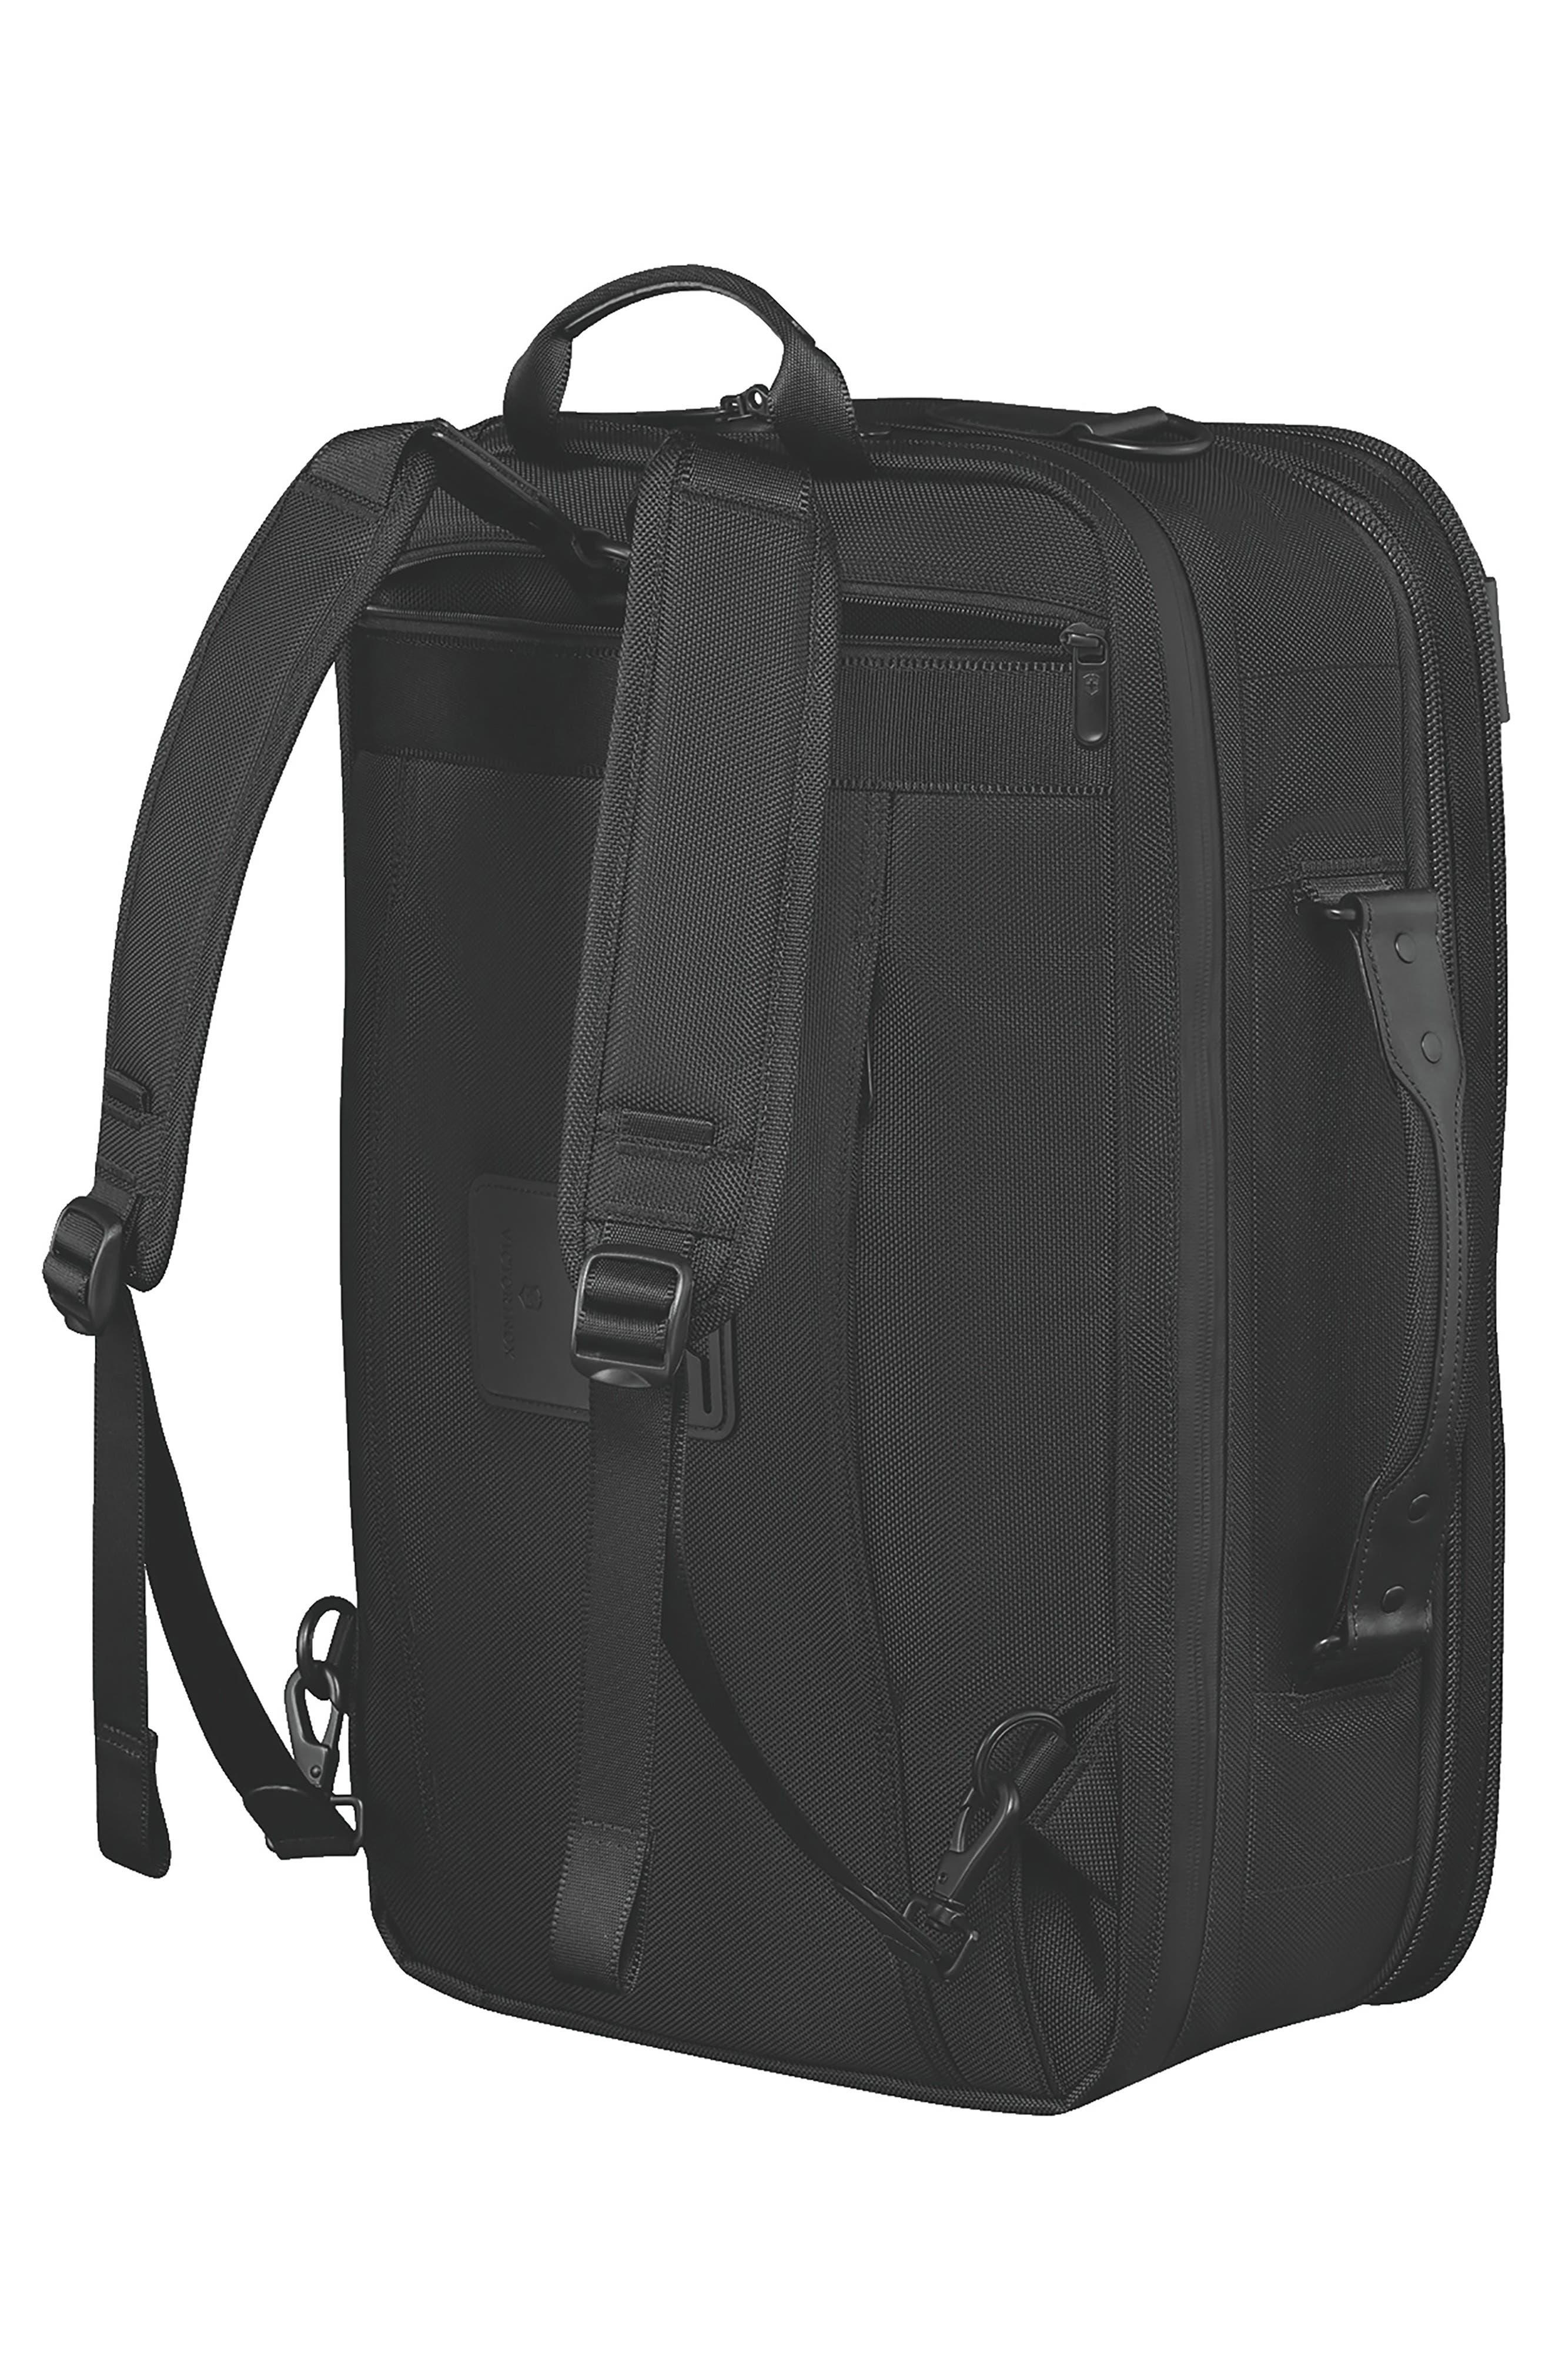 Lexicon 2.0 Convertible Backpack,                             Alternate thumbnail 2, color,                             Black